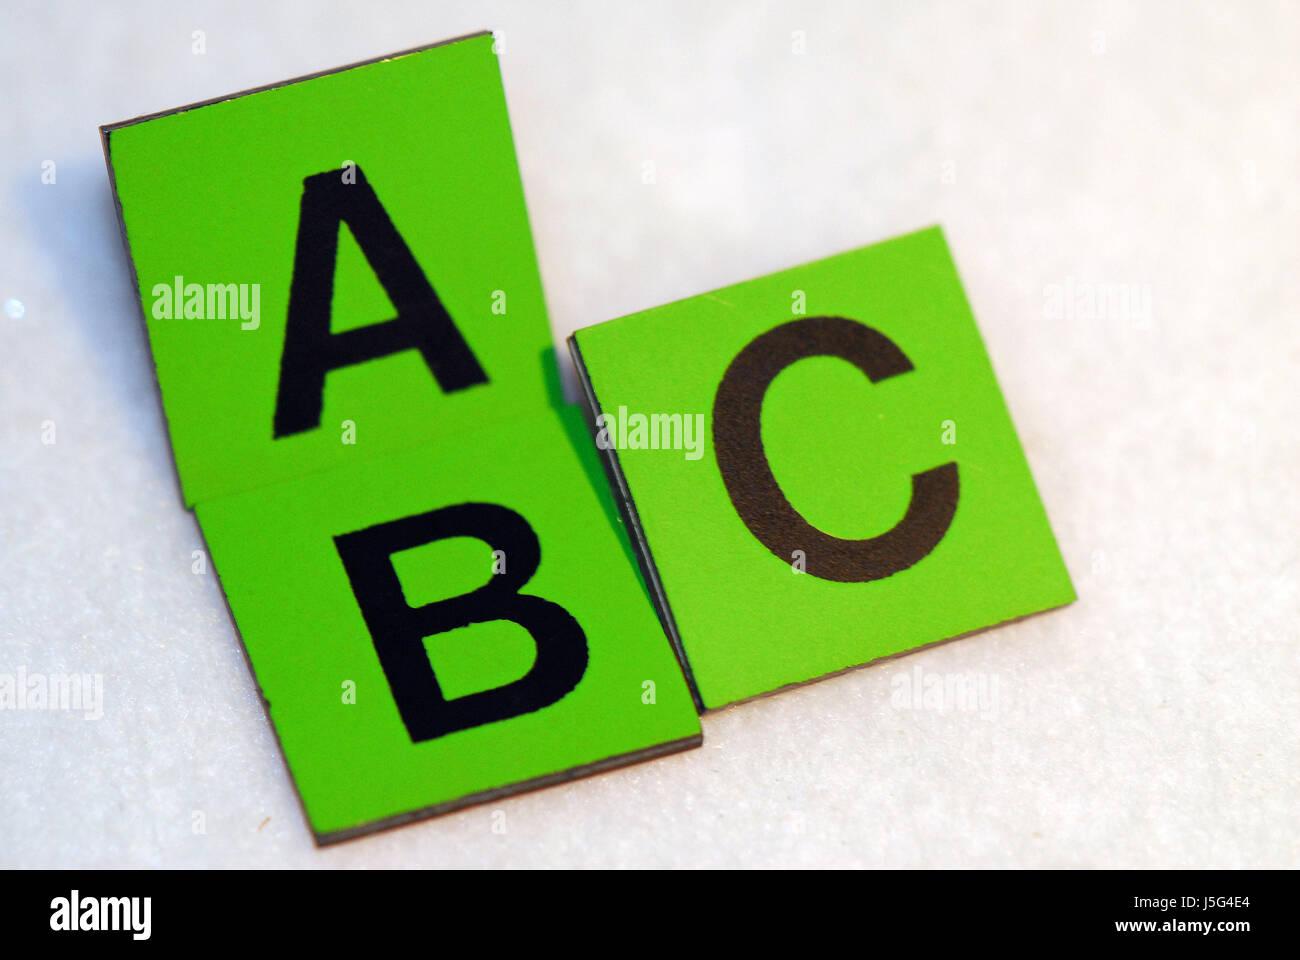 Alphabetic Letters Stock Photos & Alphabetic Letters Stock